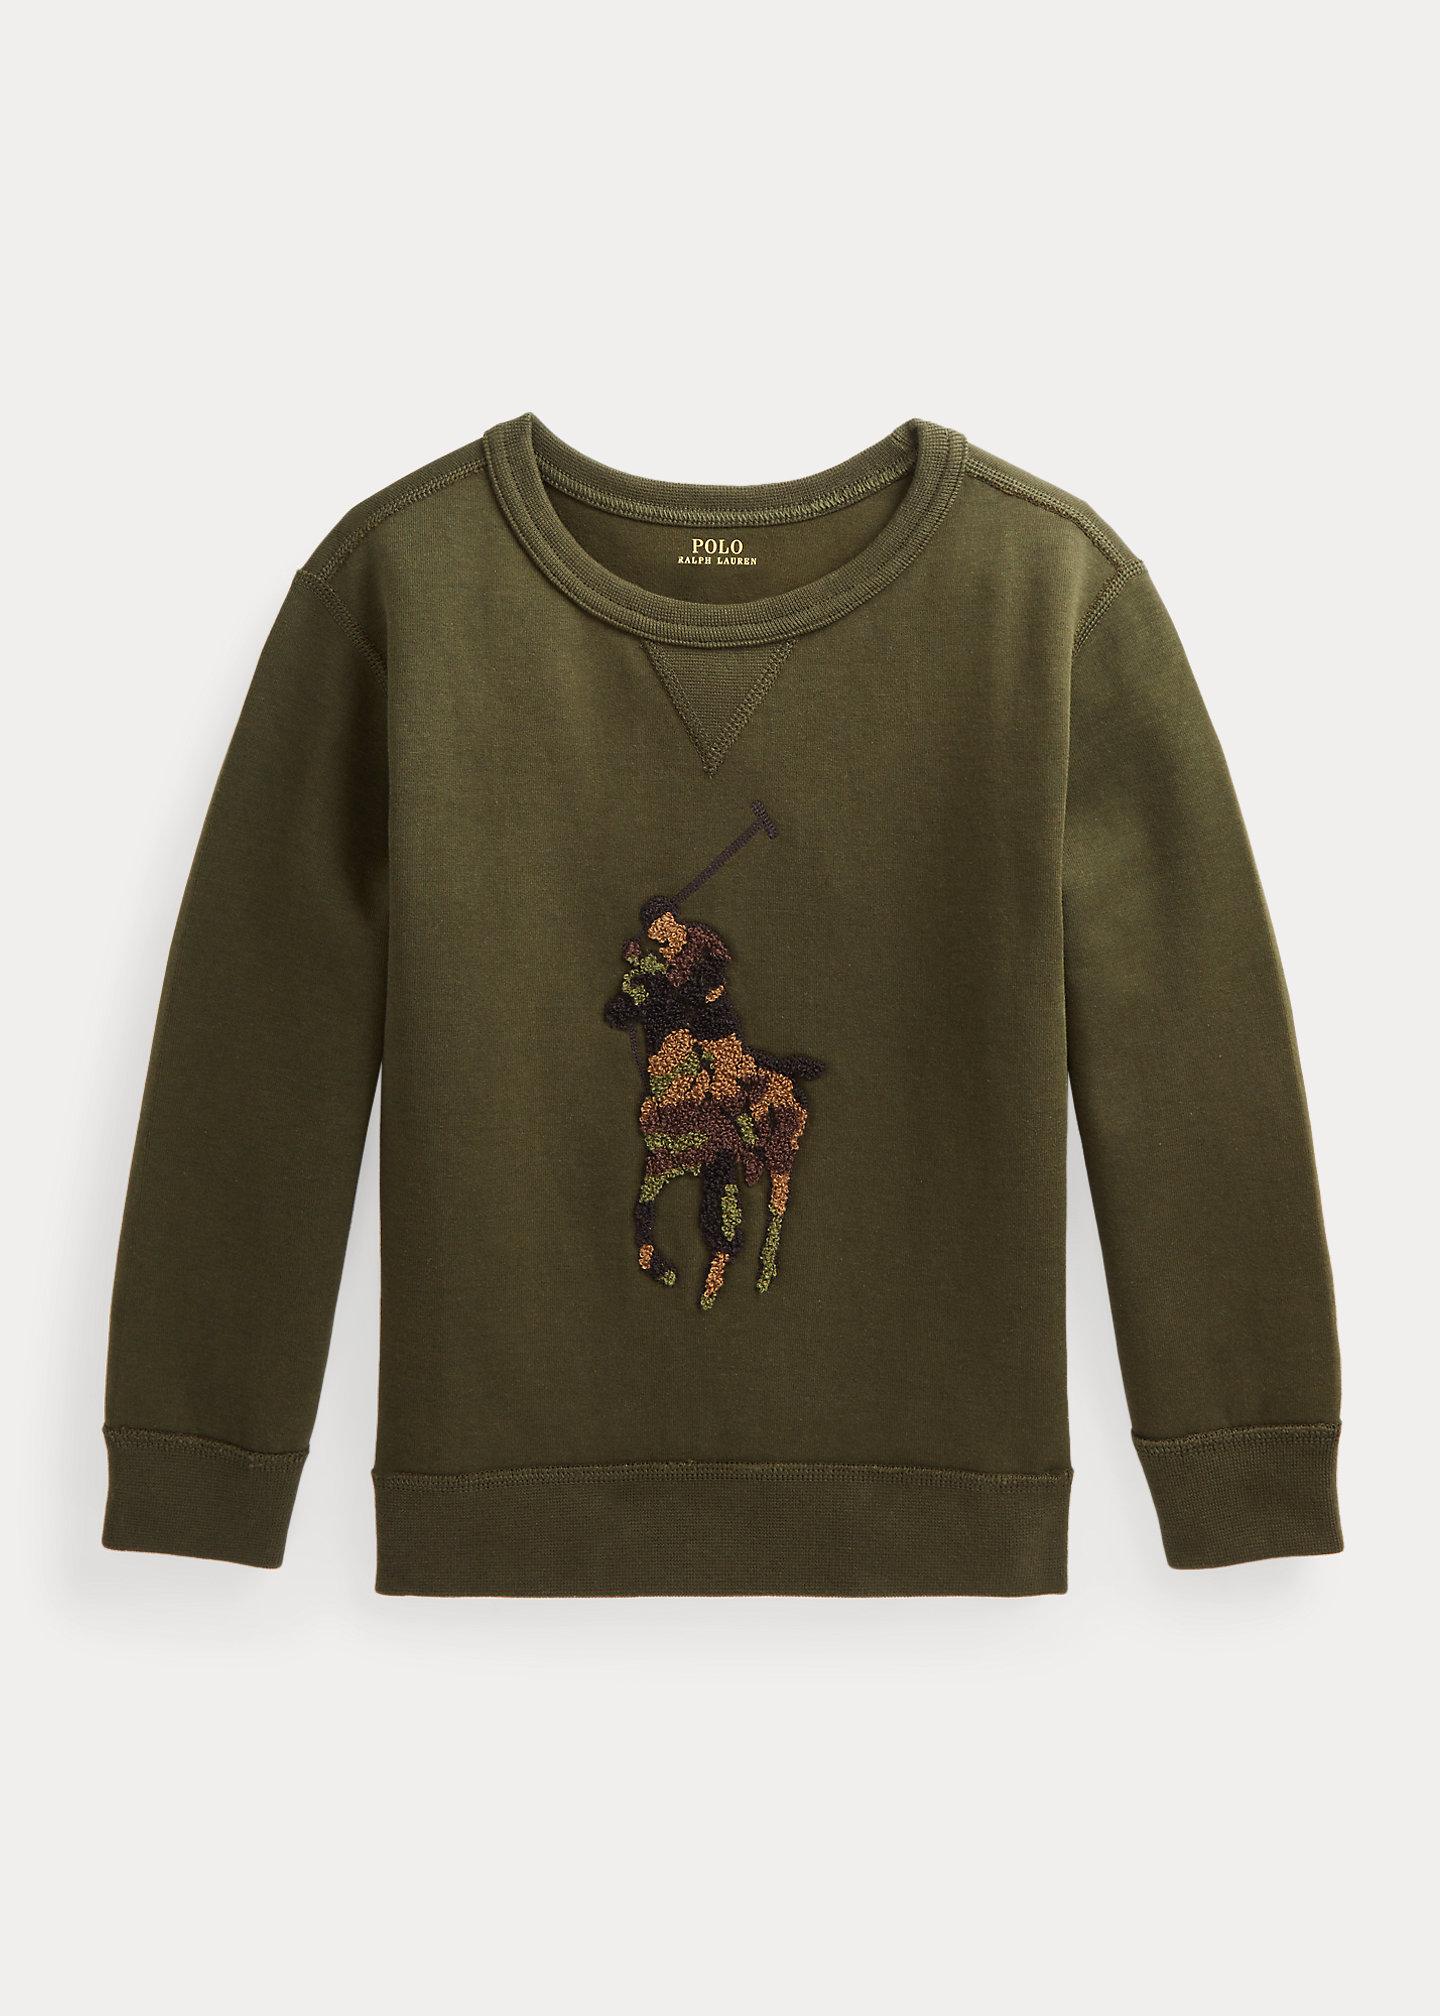 Polo Ralph Lauren Big Pony Double Knit Sweatshirt